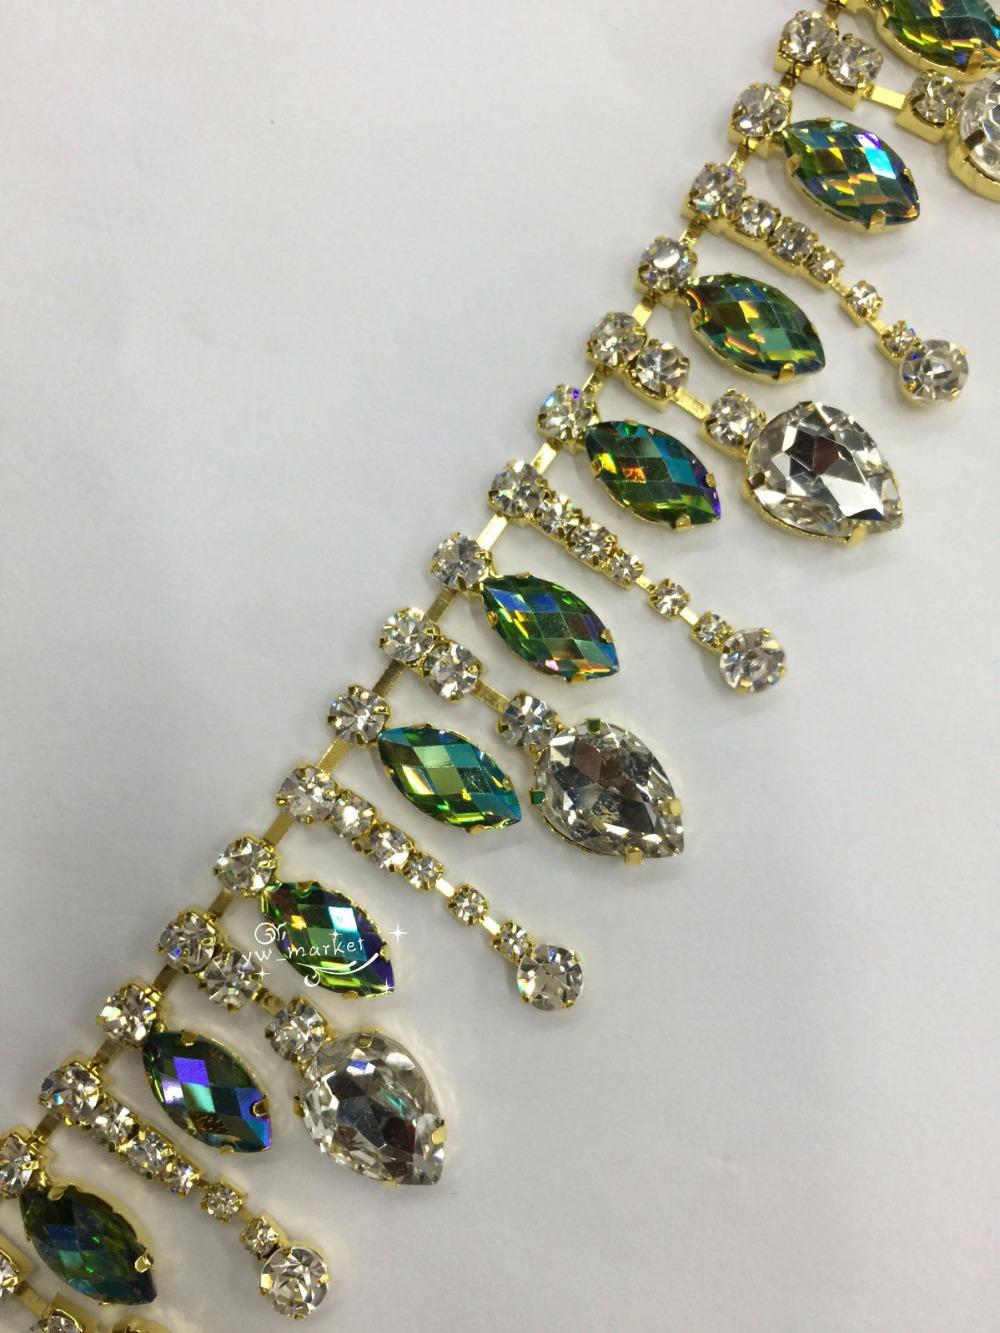 Free shipment Fashion handicrafts costume rhinestone applique color AB rhinestone trims sewing accessories x 1 yard (A590)(China (Mainland))